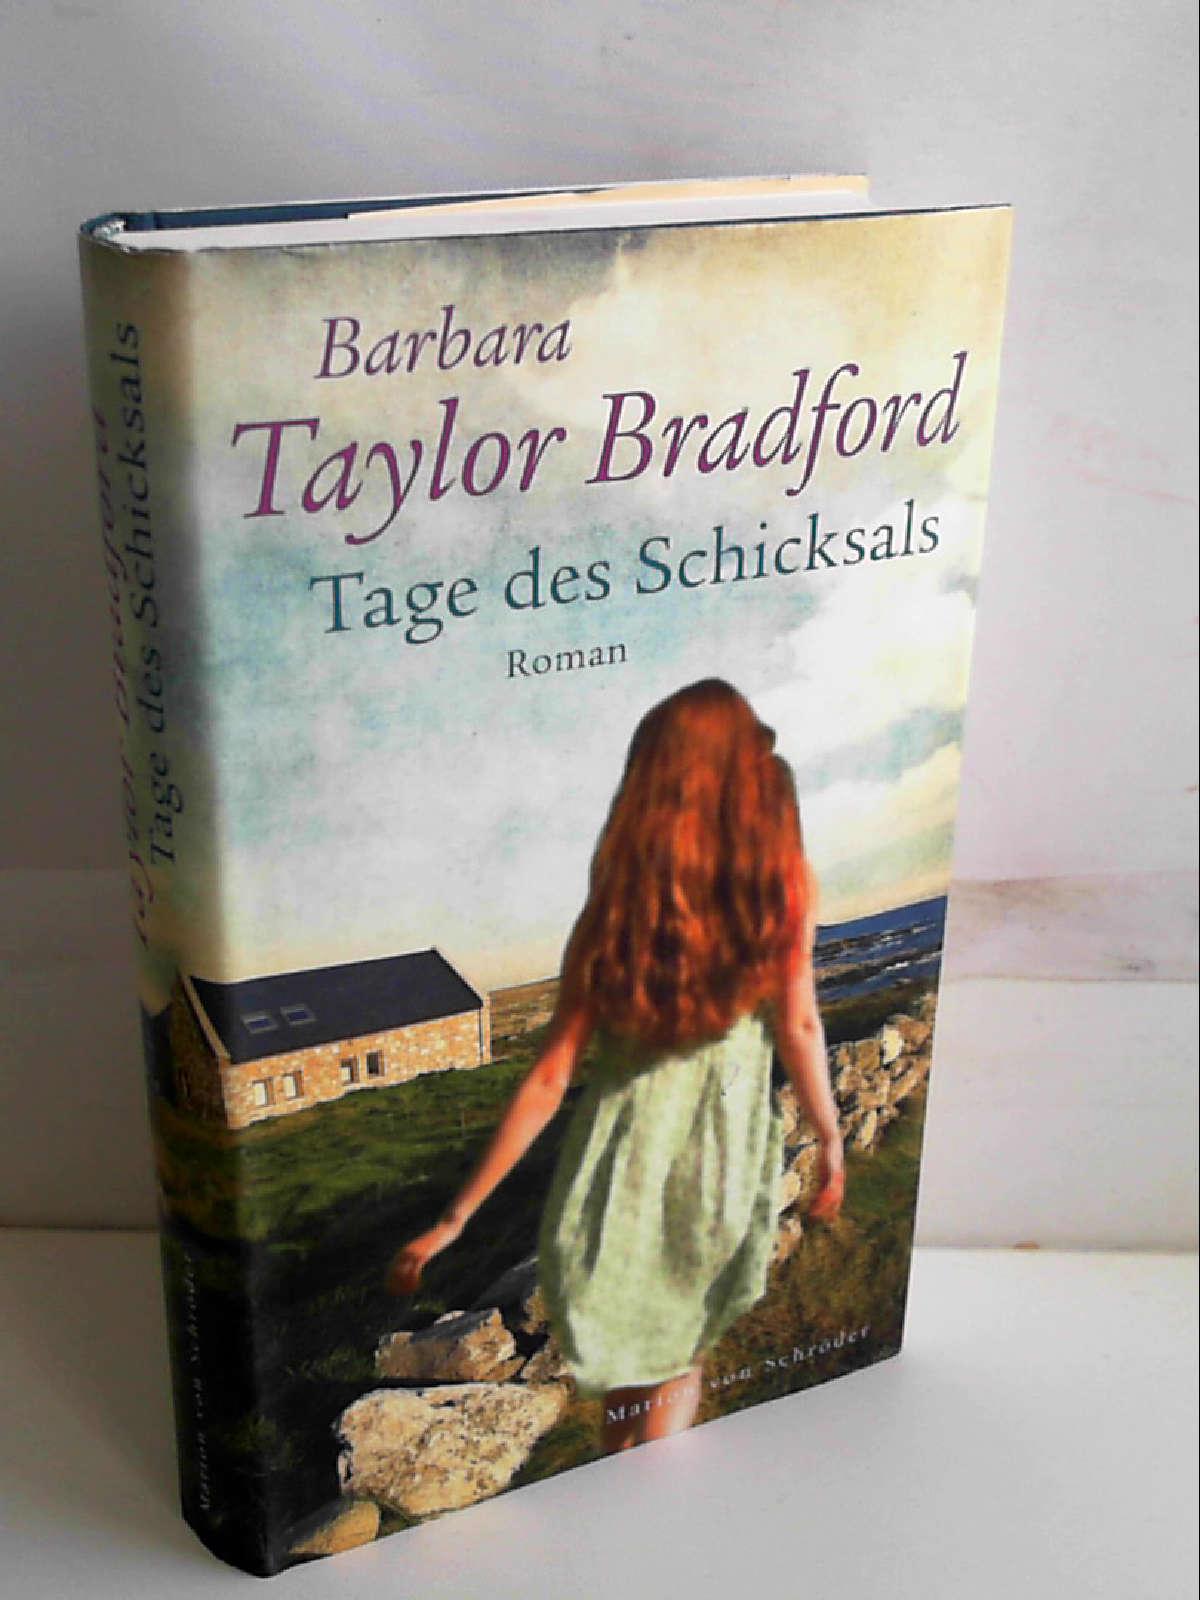 Tage des Schicksals (Ein Ravenscar-Roman, Band 3) [Mar 02, 2011] Taylor Bradford, Barbara and Darius, Beate - Barbara Taylor Bradford